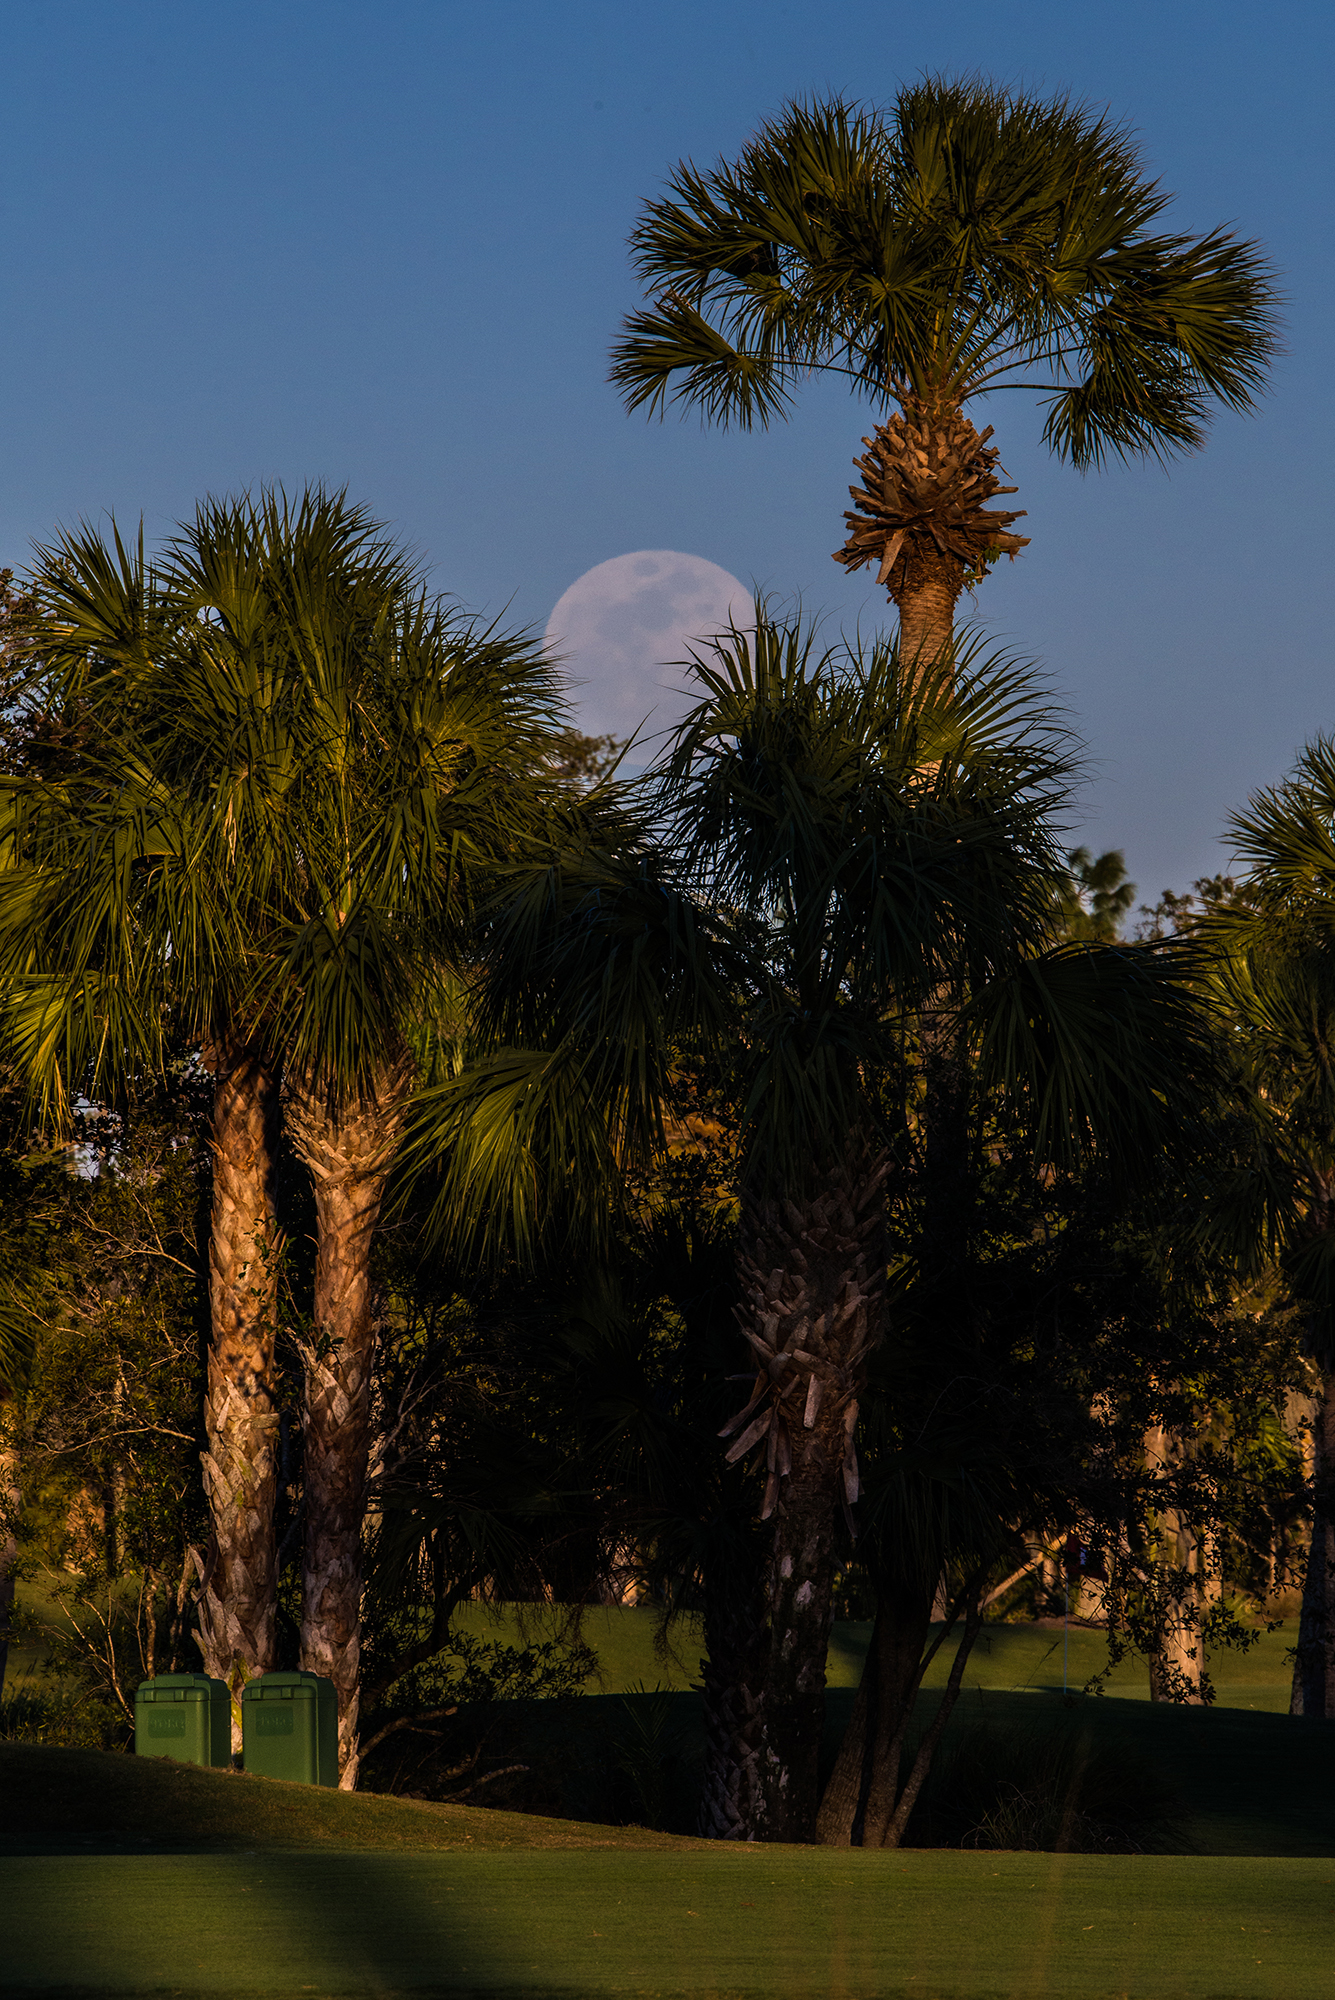 #supermoon, #bluemoon, #risingmoon, #palms, #firstsight, #sky